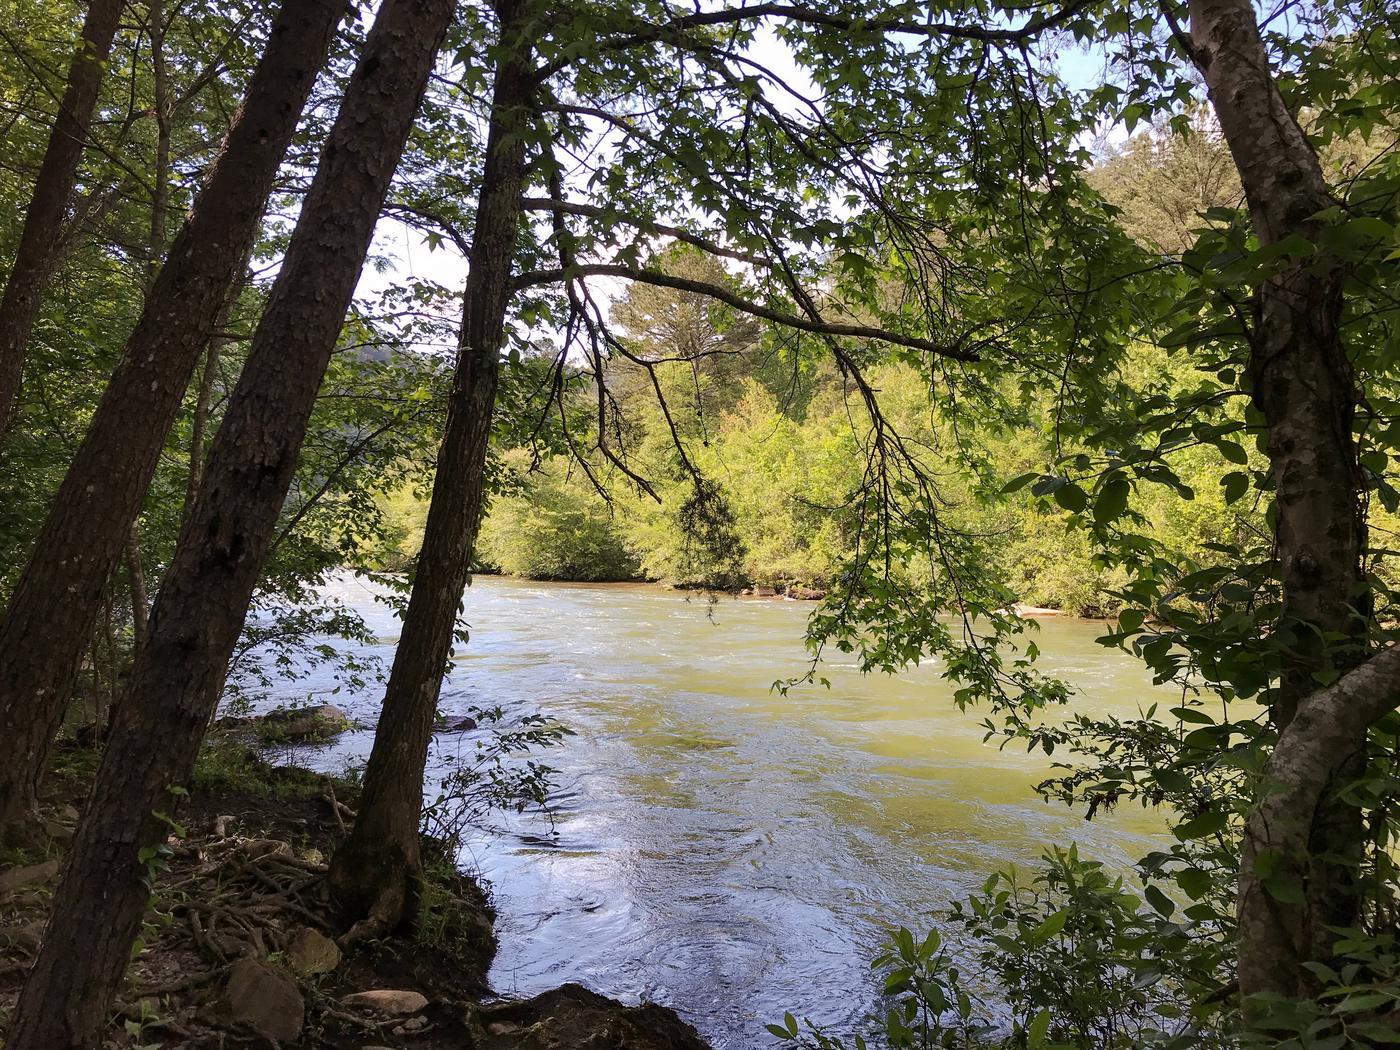 Ocoee River flowing beside campsite